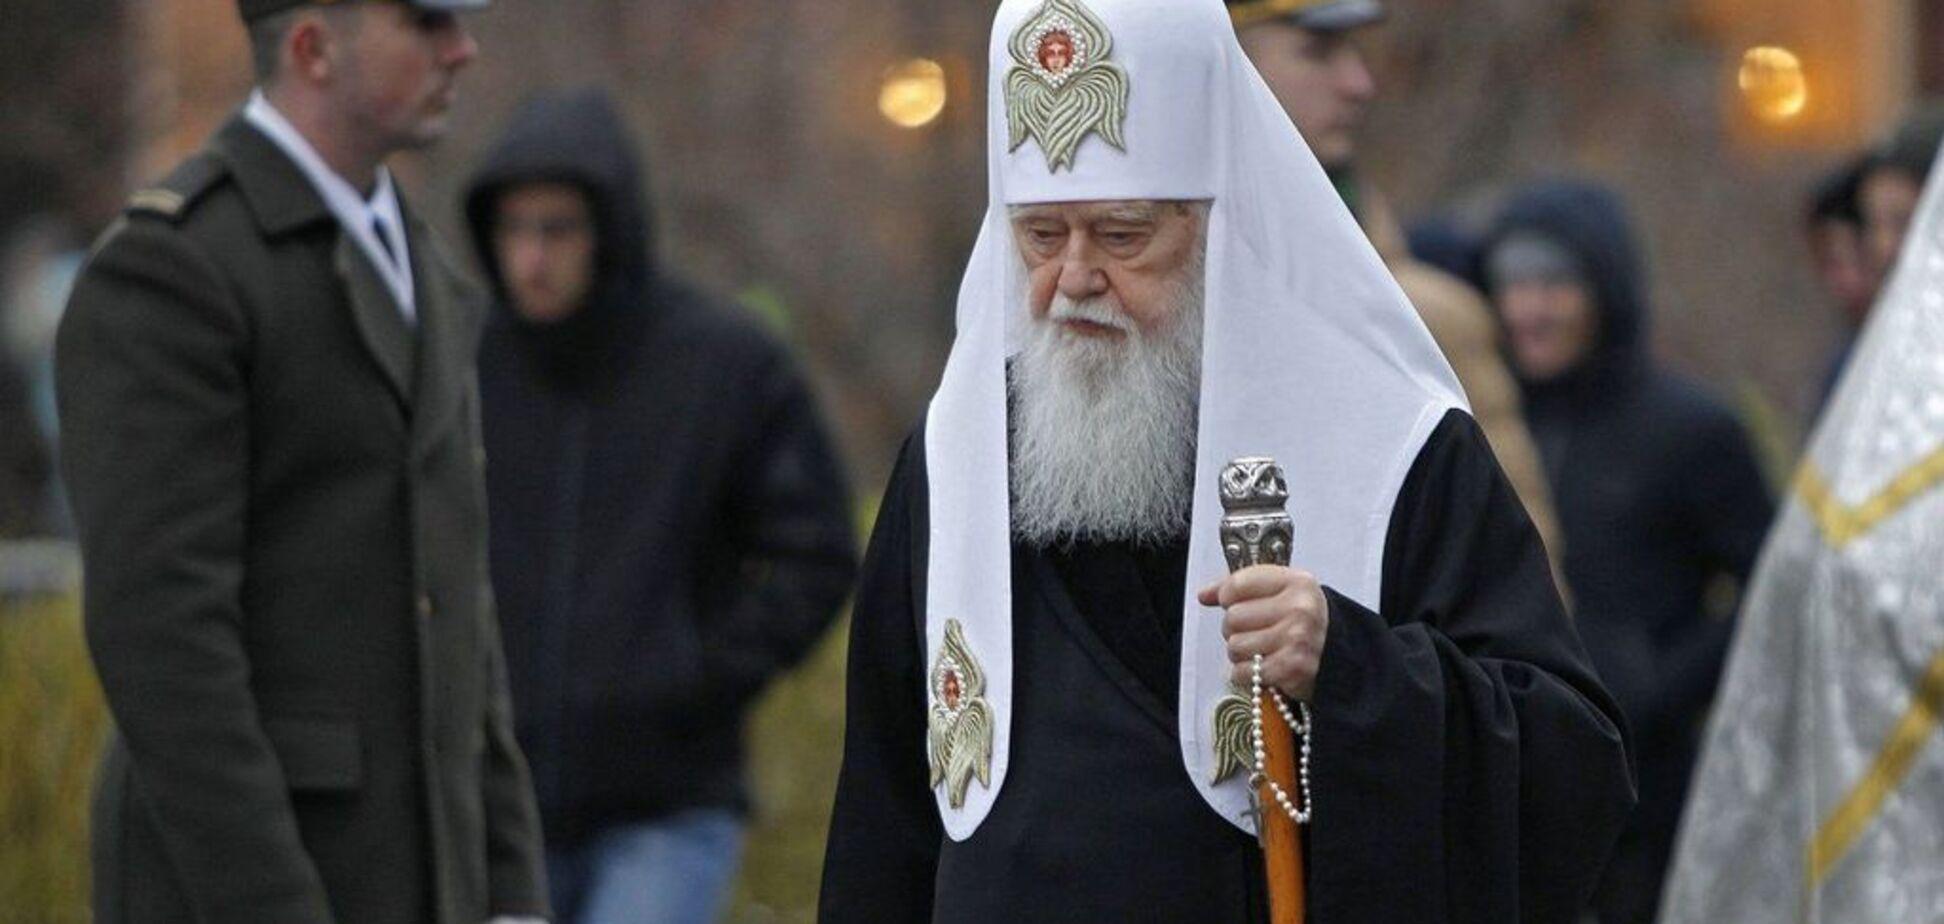 Константинополь зняв анафему з патріарха Філарета і змінив статус УПЦ КП